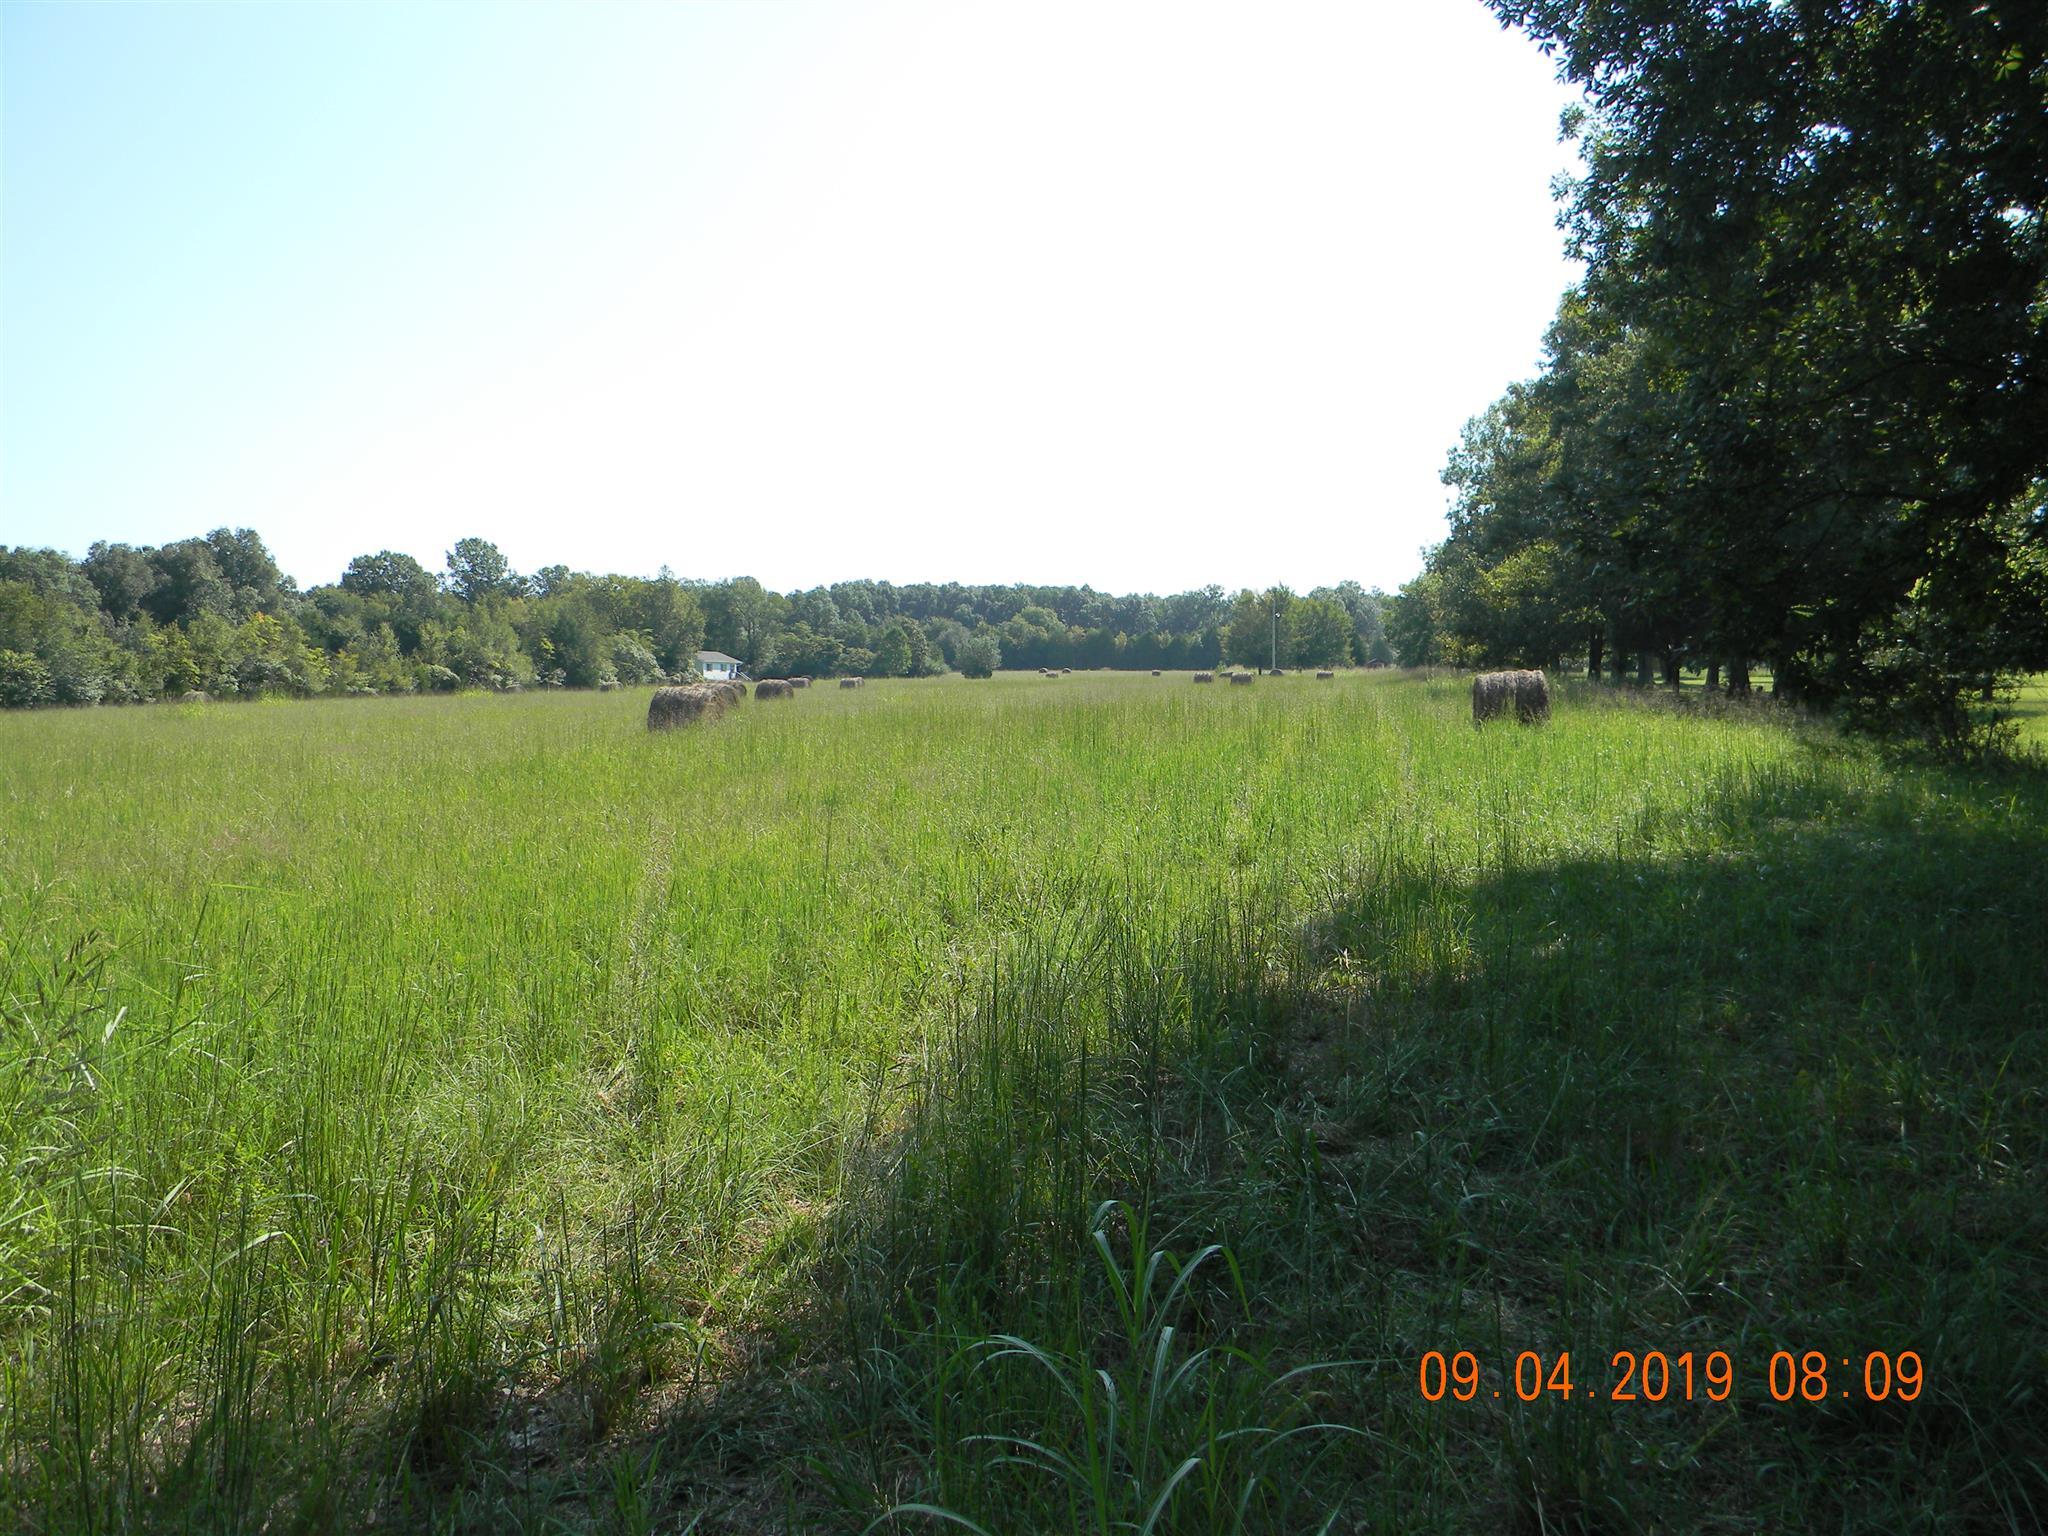 0 Reese , Shelbyville, TN 37160 - Shelbyville, TN real estate listing